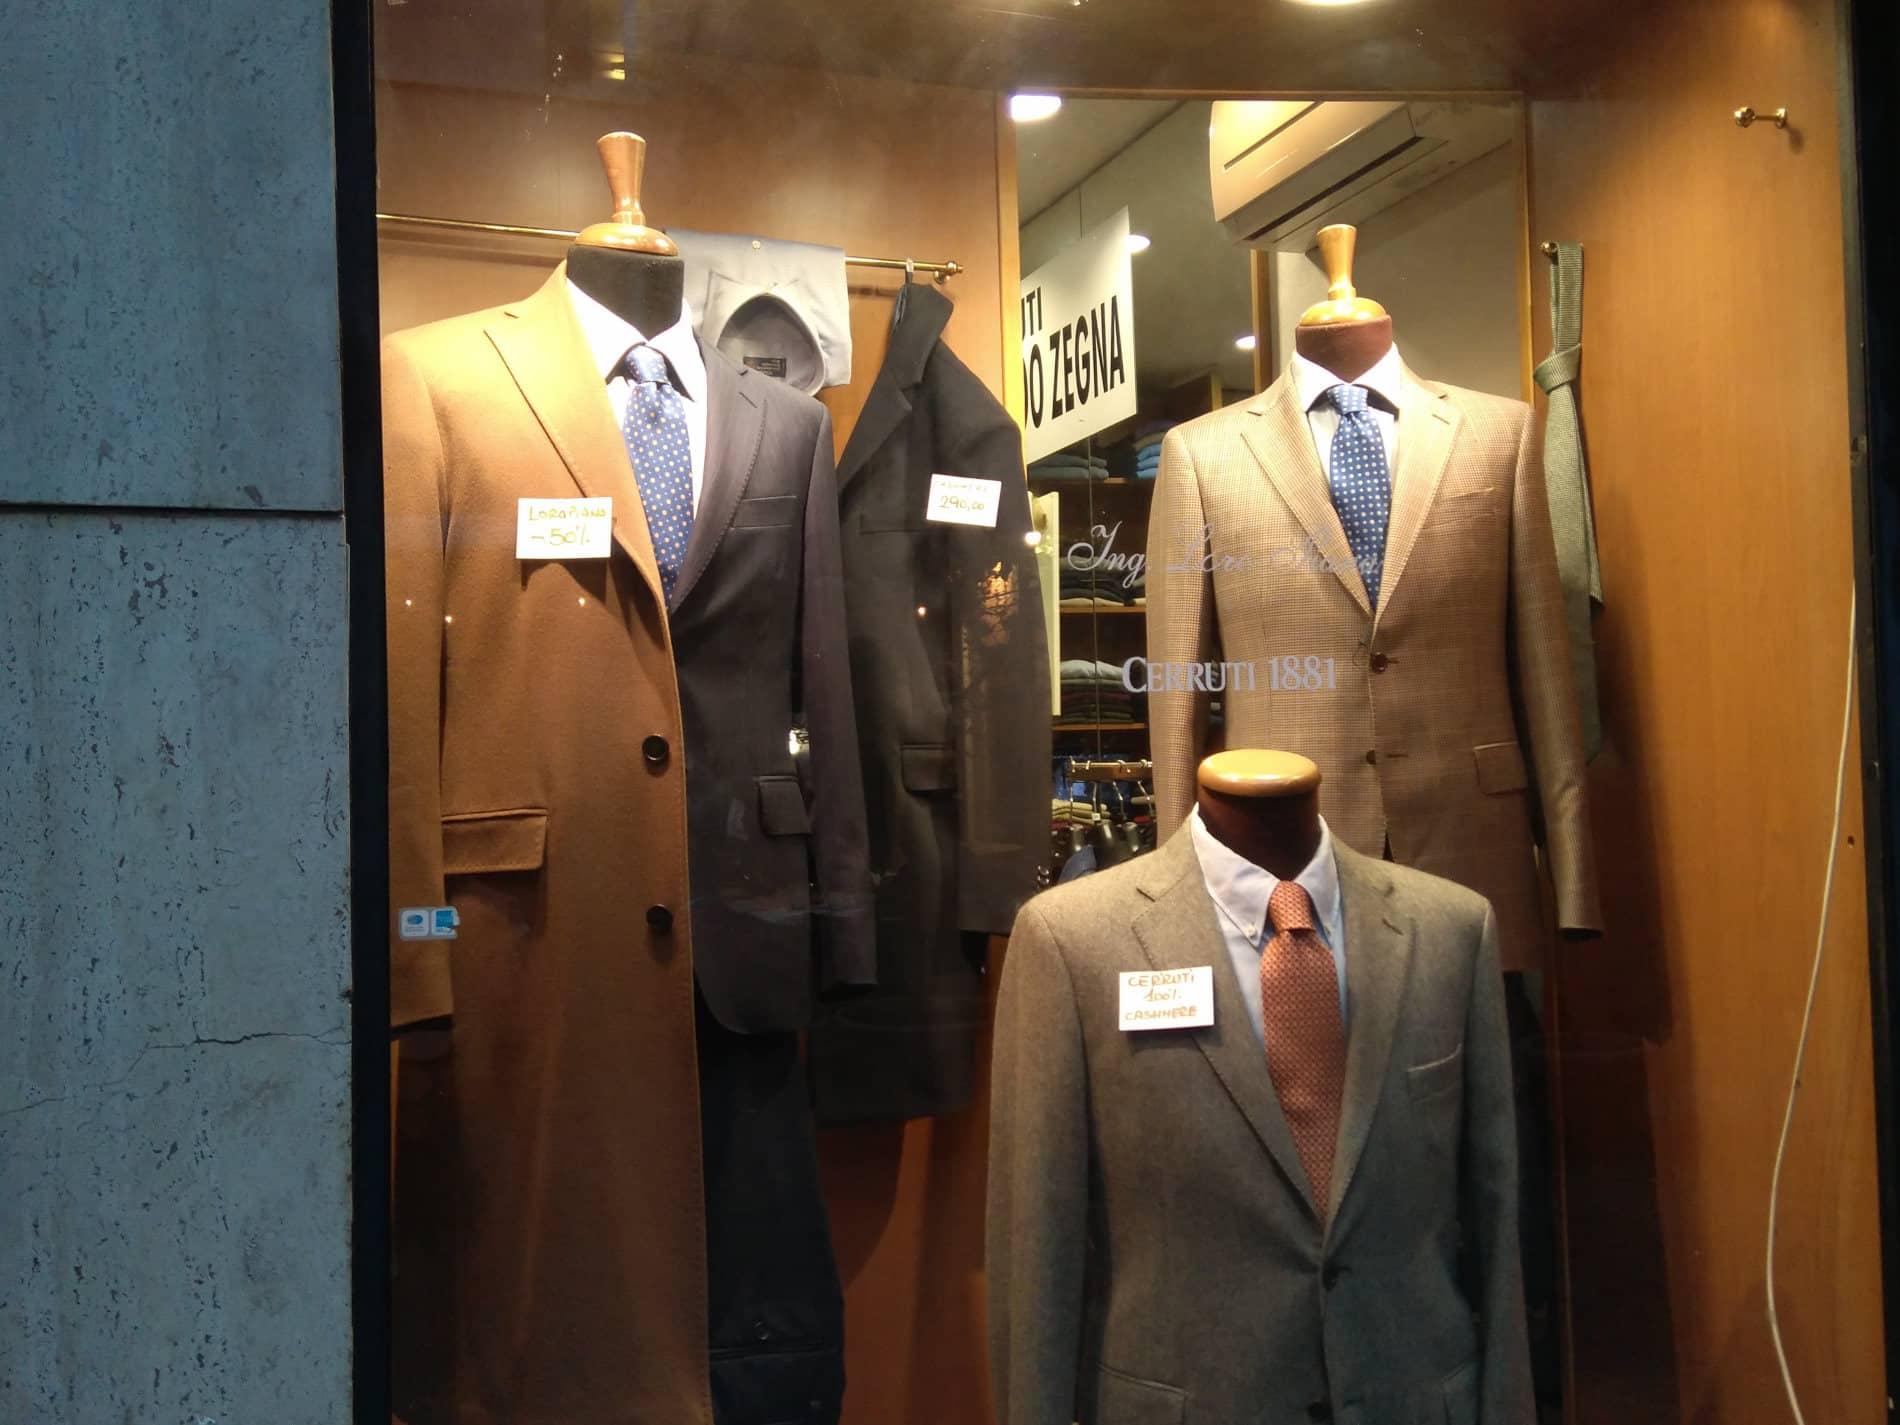 Regalos recuerdos Roma moda